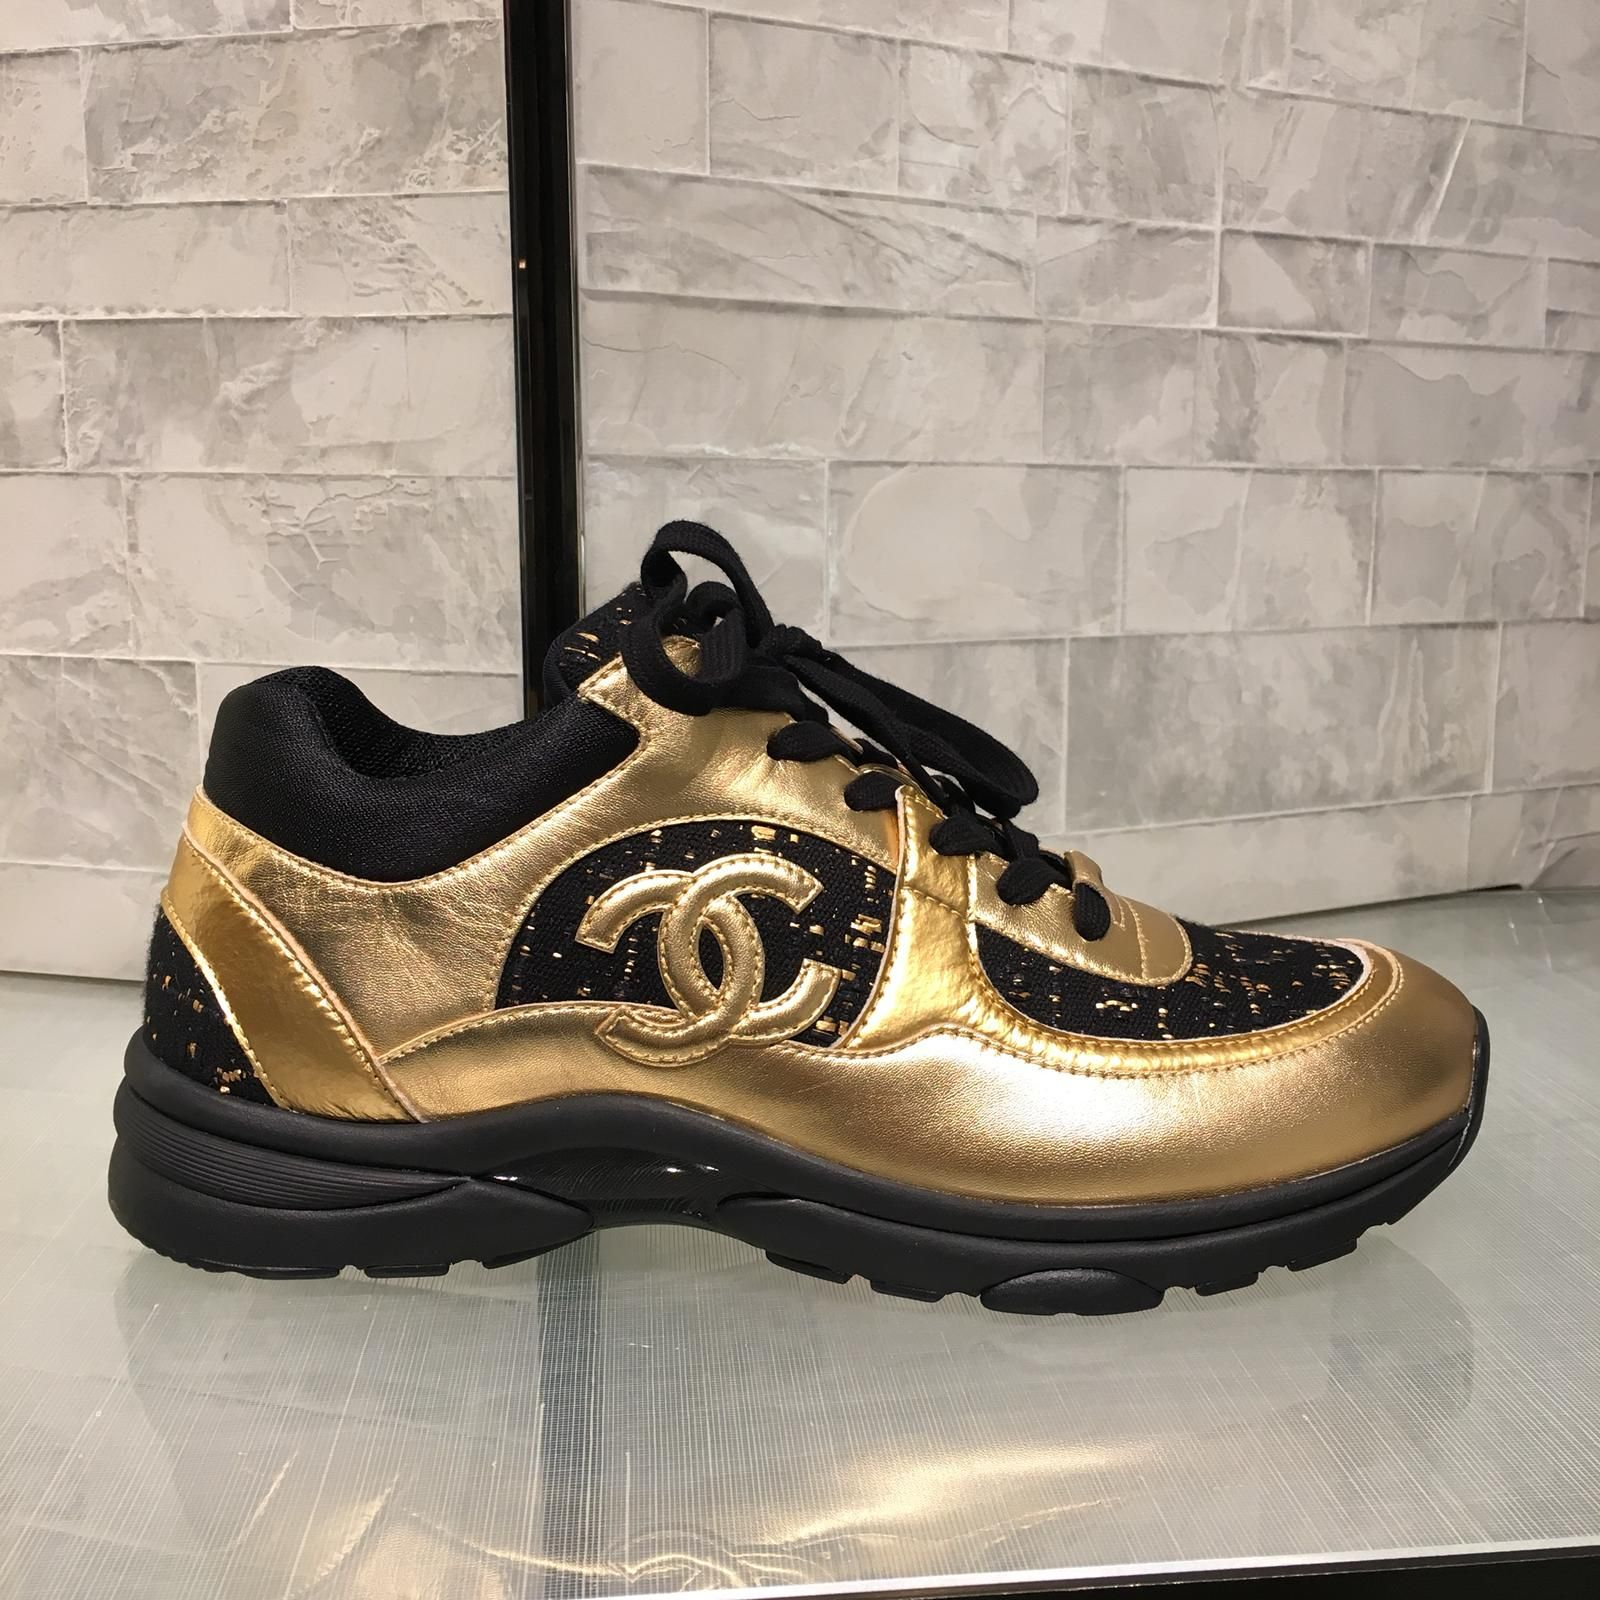 CHANEL PRE FALL 2019 EGYPT Gold Sneaker